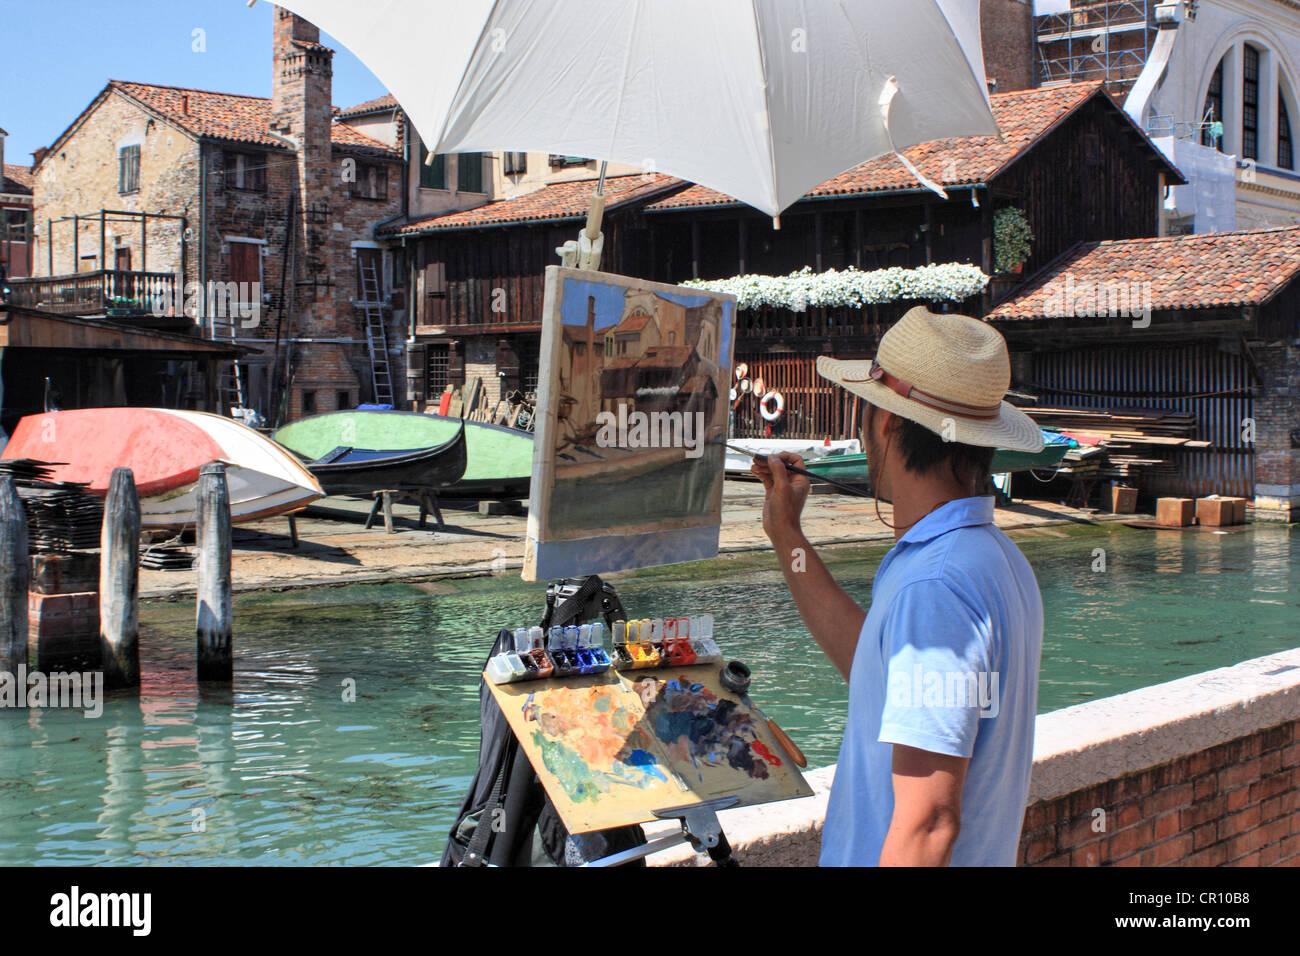 Artist painting en plein air, Venice, Italy Stock Photo